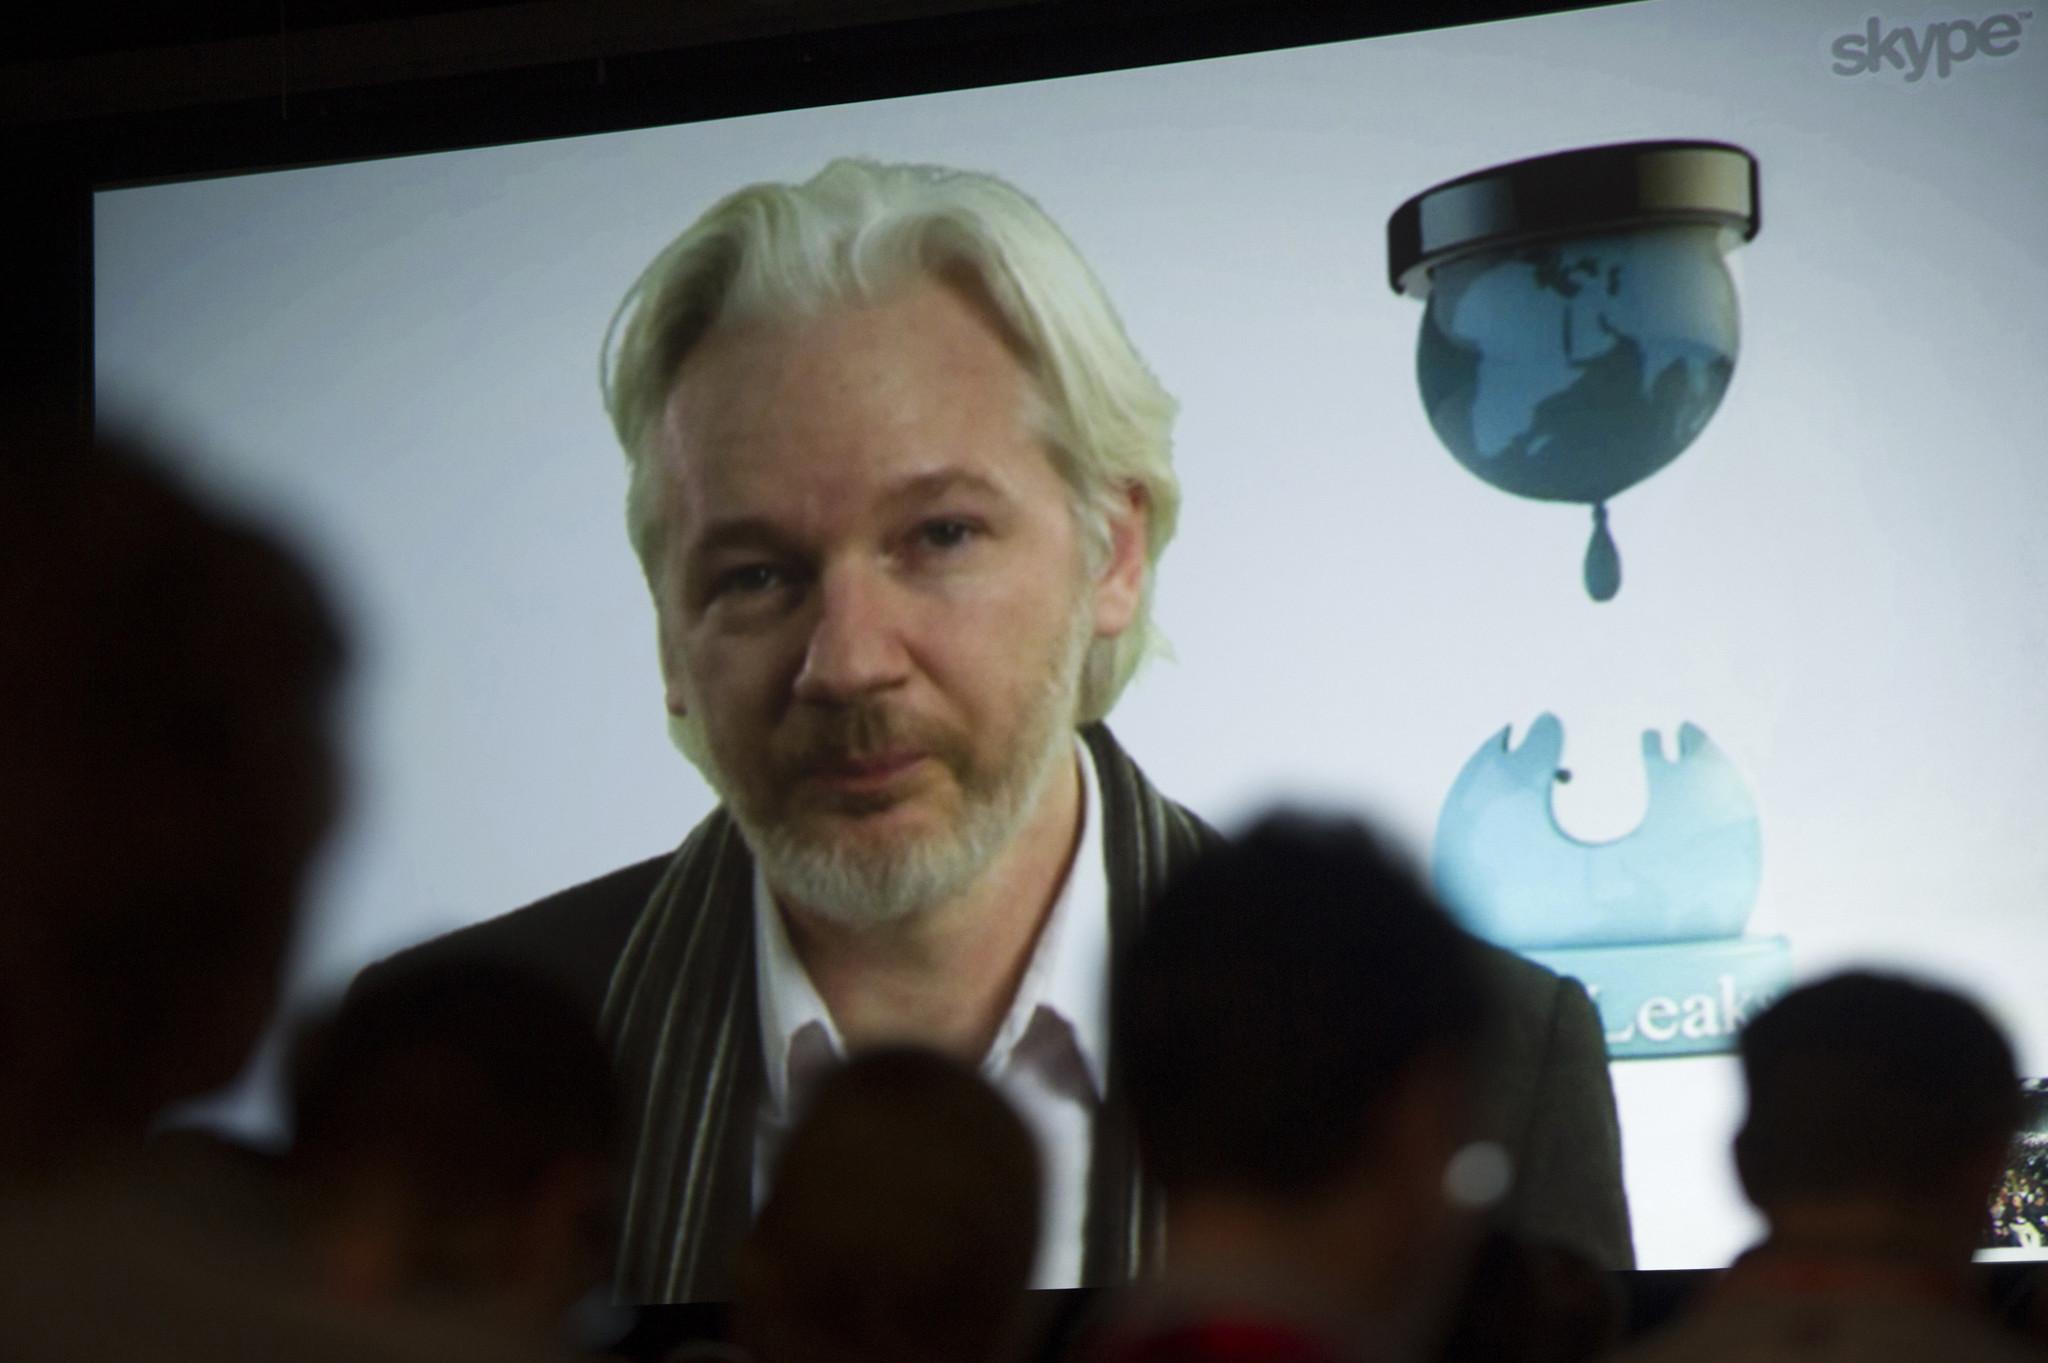 http://www.trbimg.com/img-5804d9bc/turbine/ct-julian-assange-wikileaks-internet-access-cut-20161017